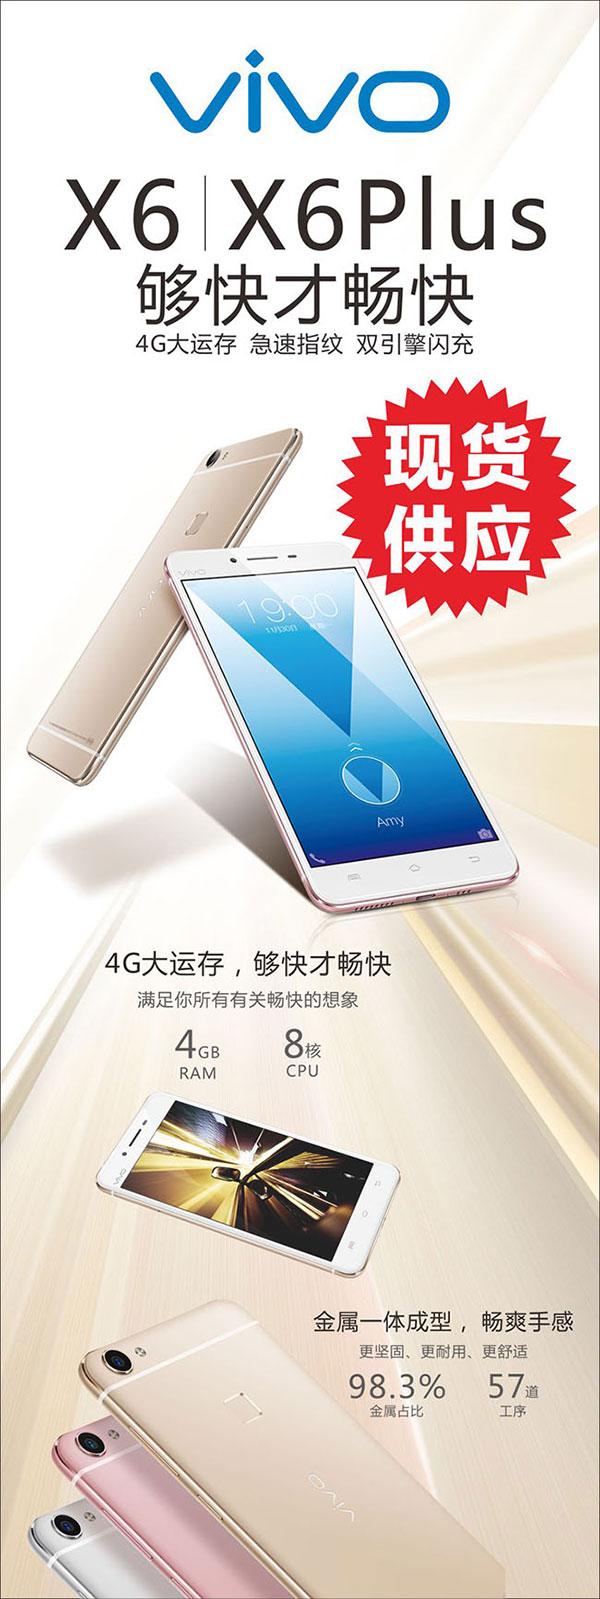 vivox6手机海报_素材中国sccnn.com